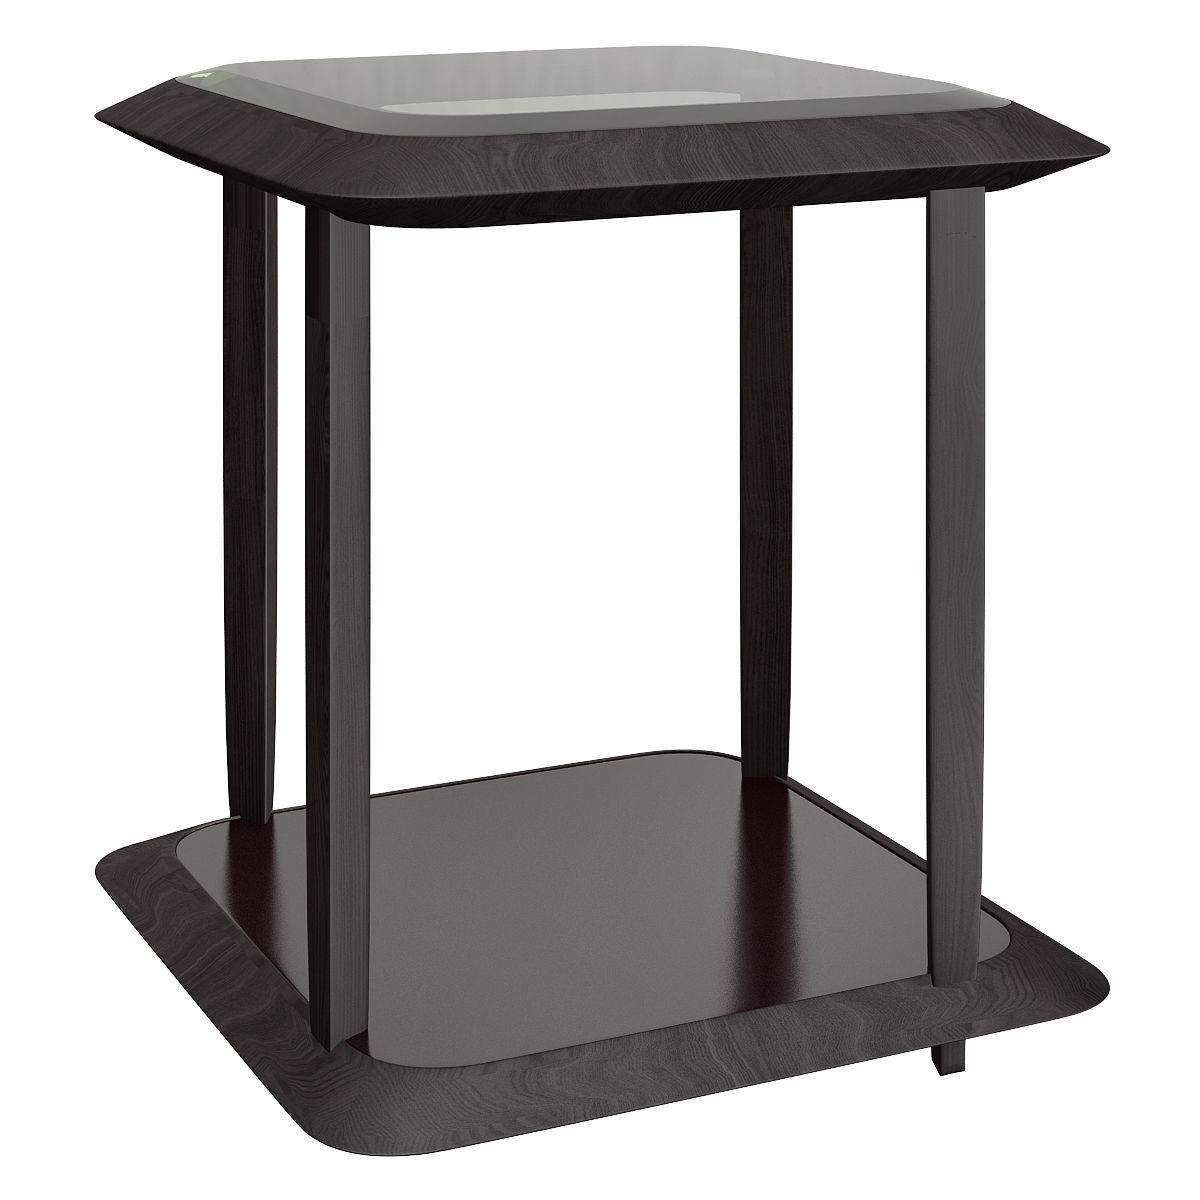 ADAM COFFEE TABLE 3d model